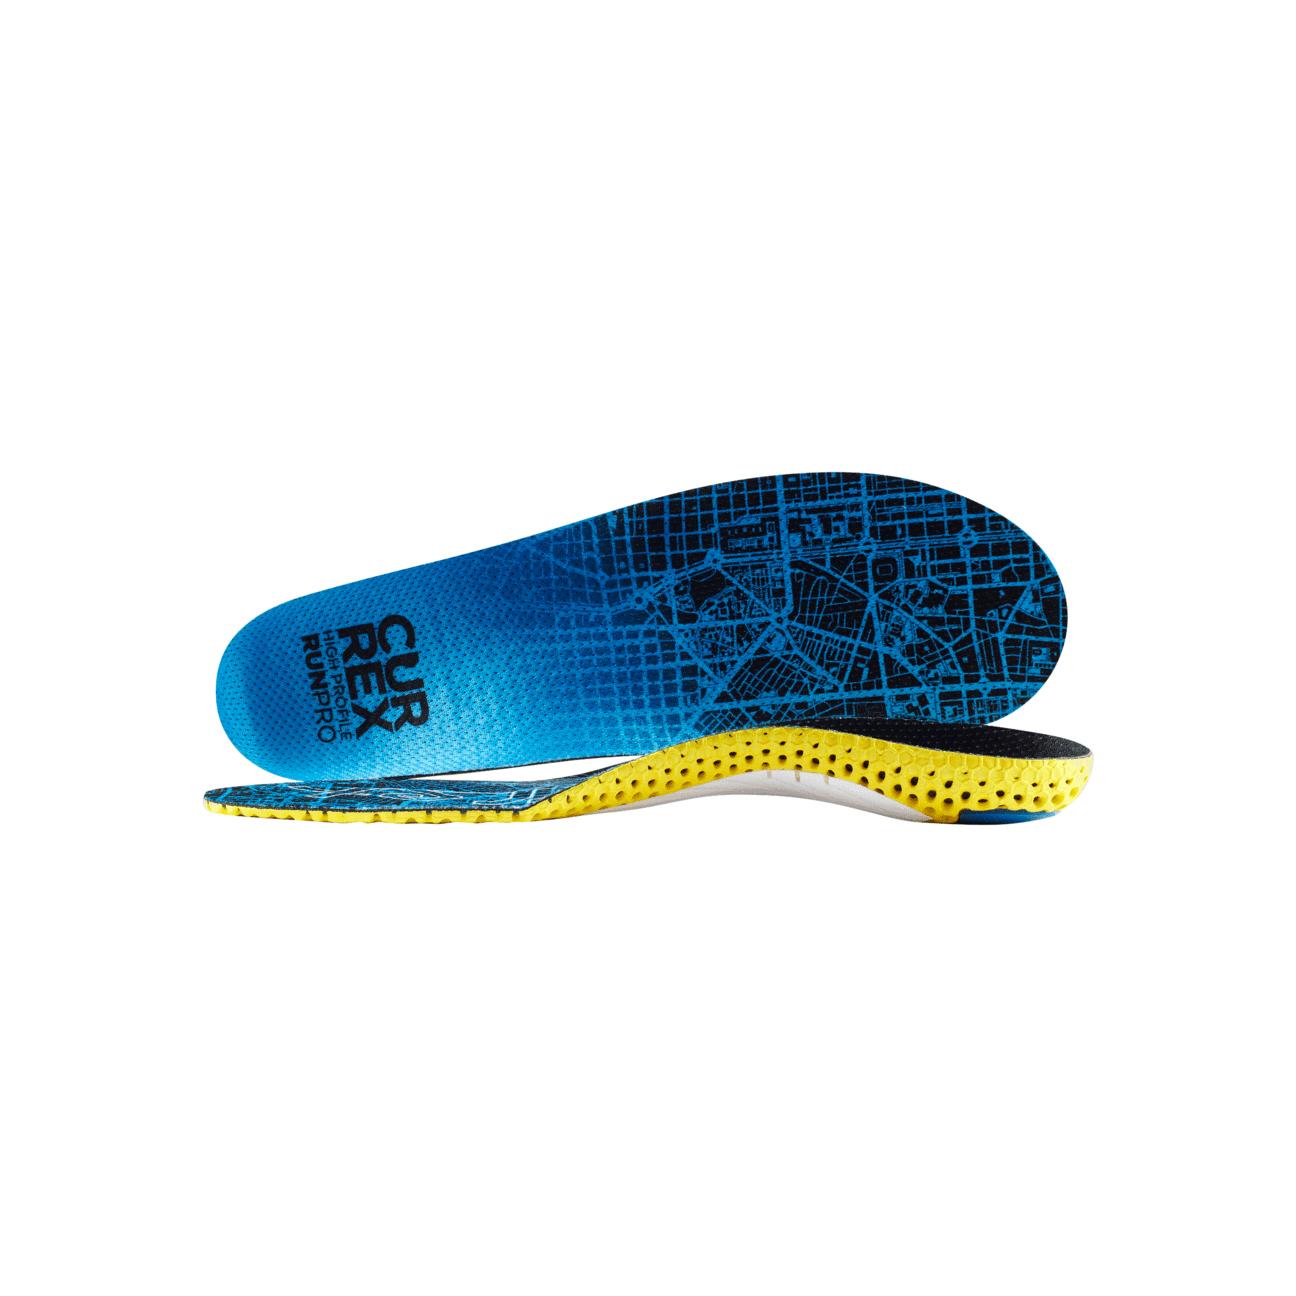 CURREX RunPro® Insole - High Profile